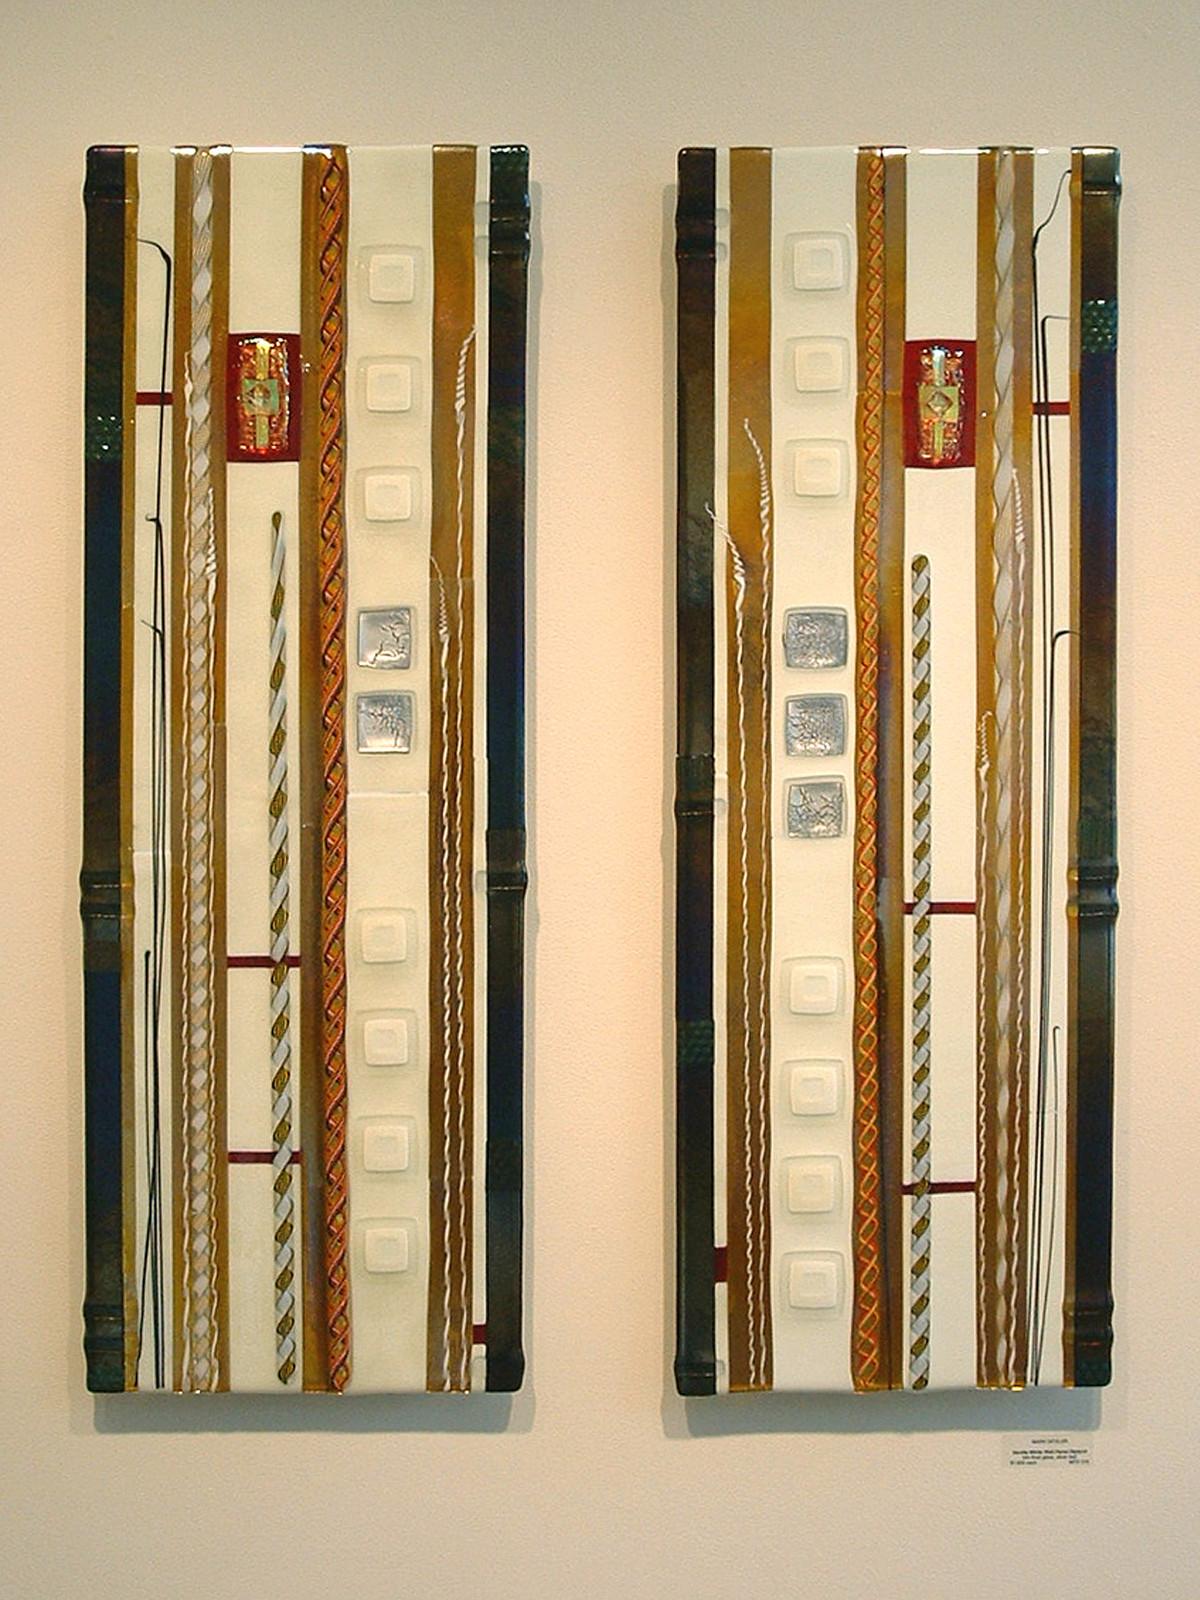 Fused Glass Wall Panels For Sale | Mark Ditzler Glass Studio